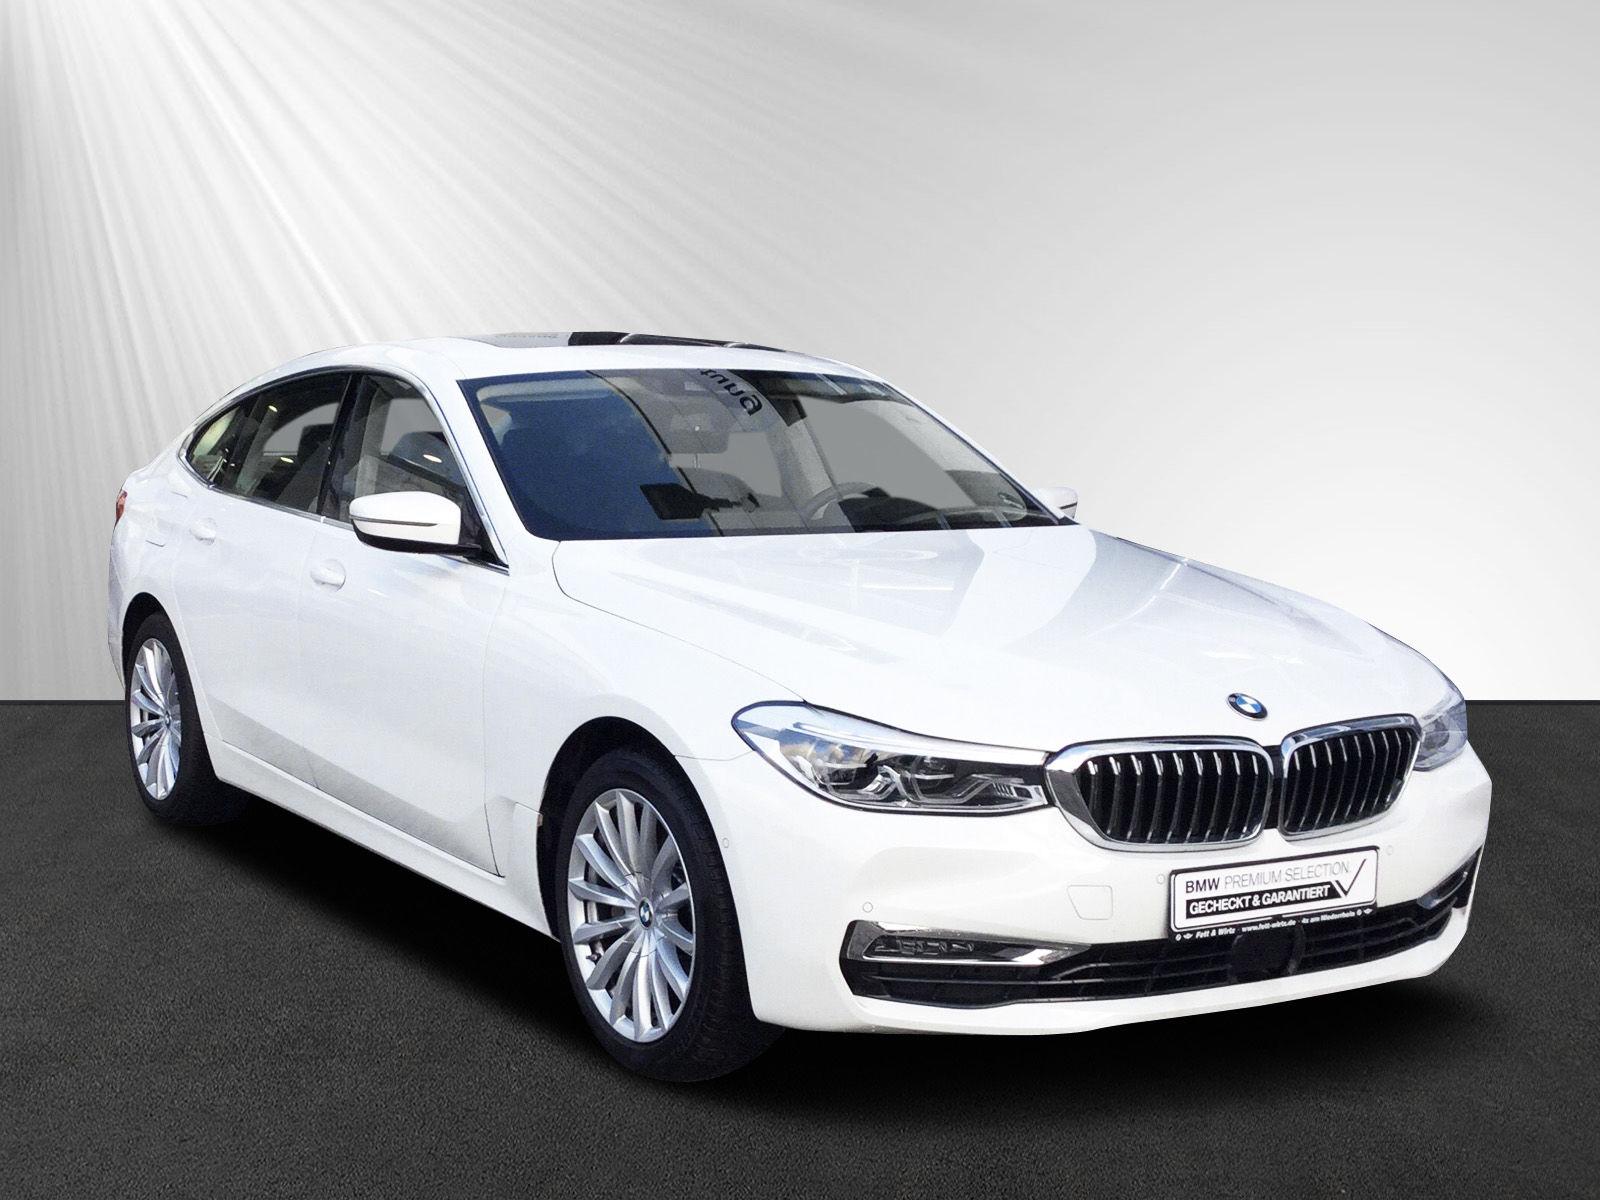 BMW 630 Gran Turismo GT A LuxuryLine Komforts DA+ Pano, Jahr 2019, petrol